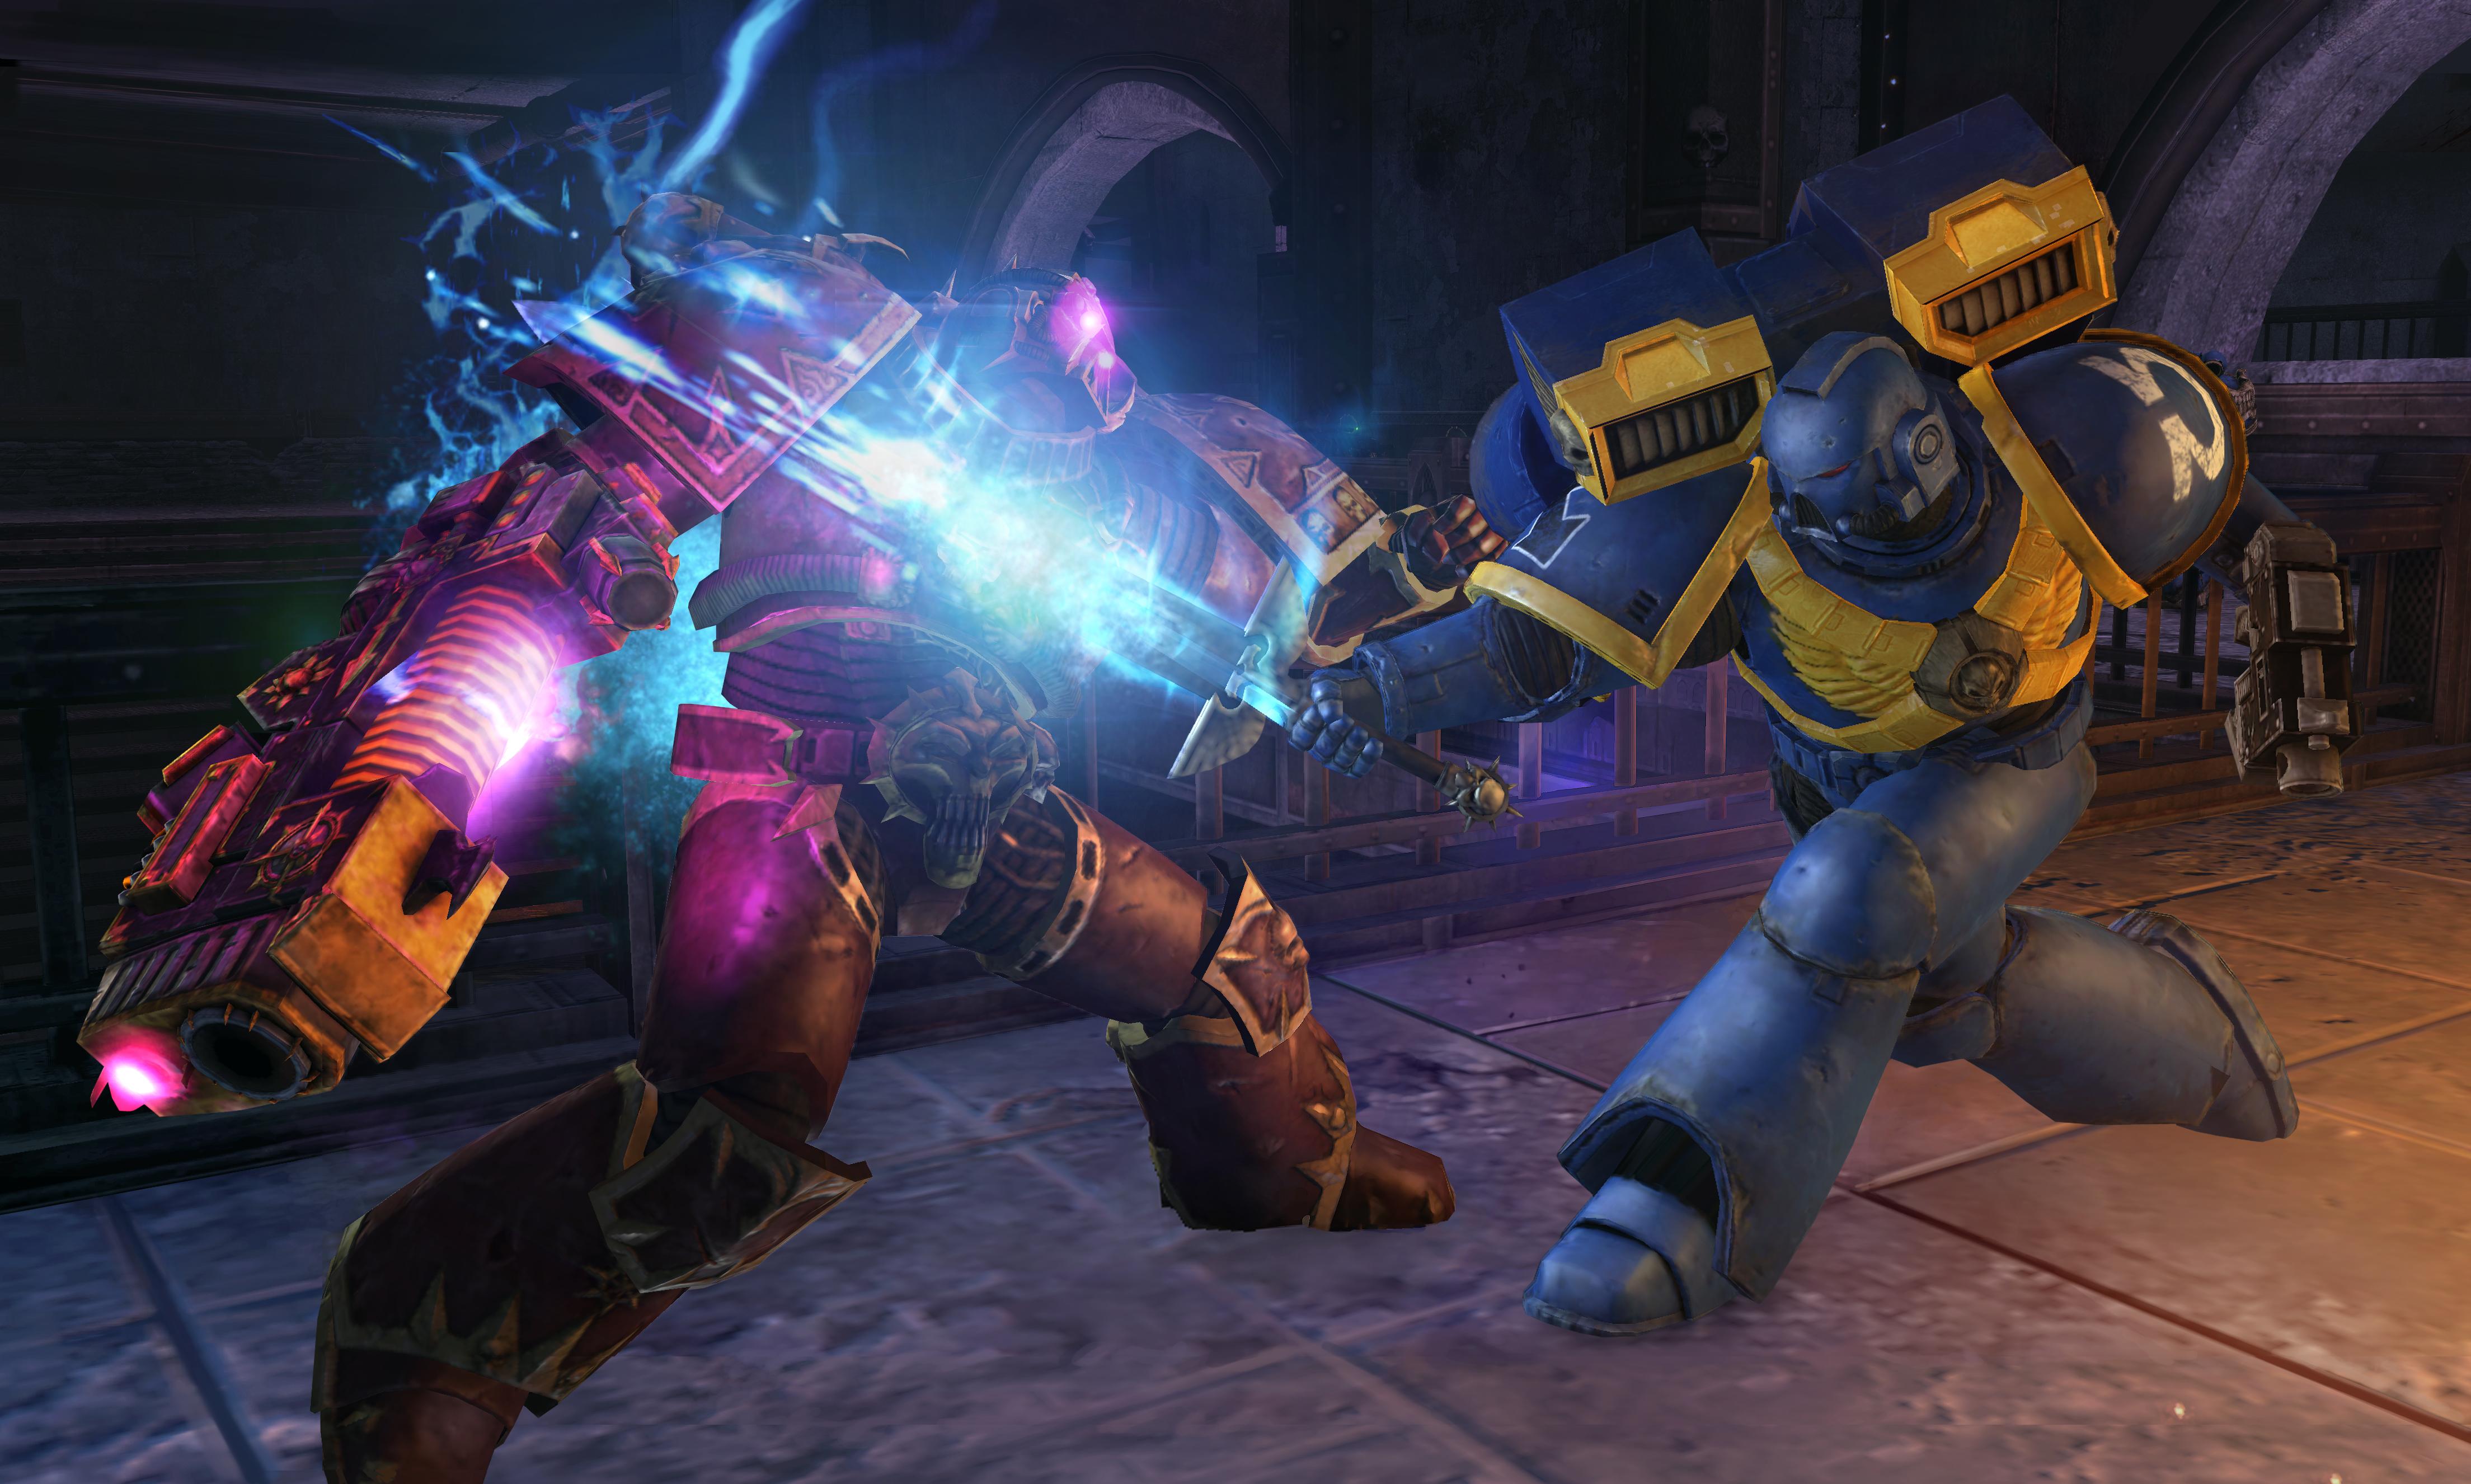 Warhammer 40,000: Space Marine - Power Sword screenshot